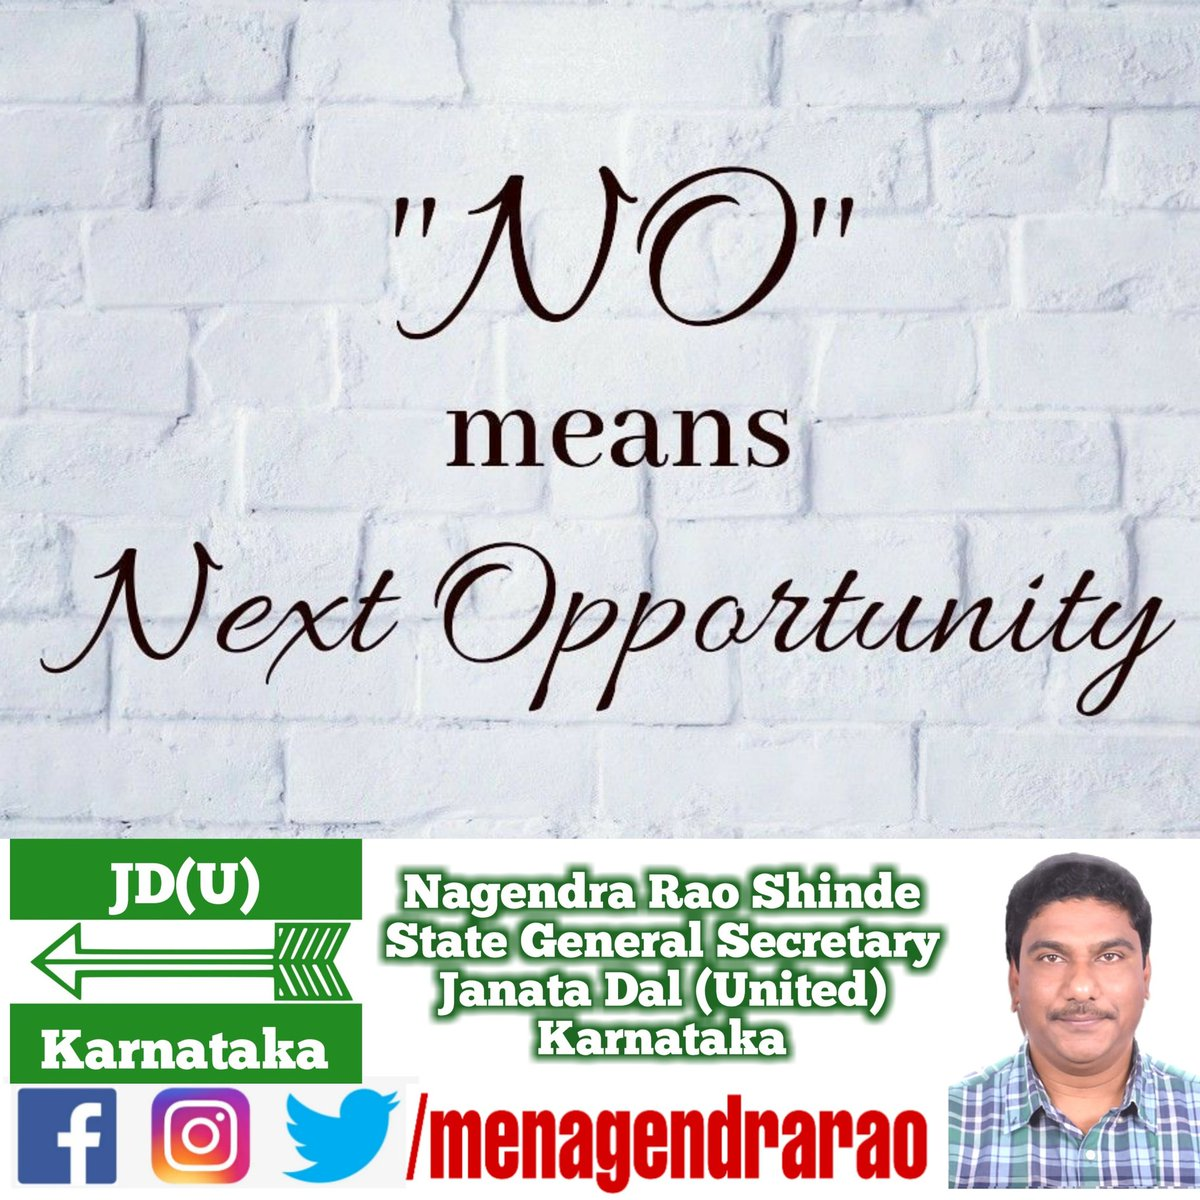 #TuesdayThoughts #JDU #Karnataka @gsecretaryjdu @NitishKumar @PrashantKishor @afaquejdu @RCP_Singh @SanjayJhaBihar @JDU_India @Jduonline @KCTyagiJDU @sanjaykumarjdu https://t.co/t62vn0yLsg